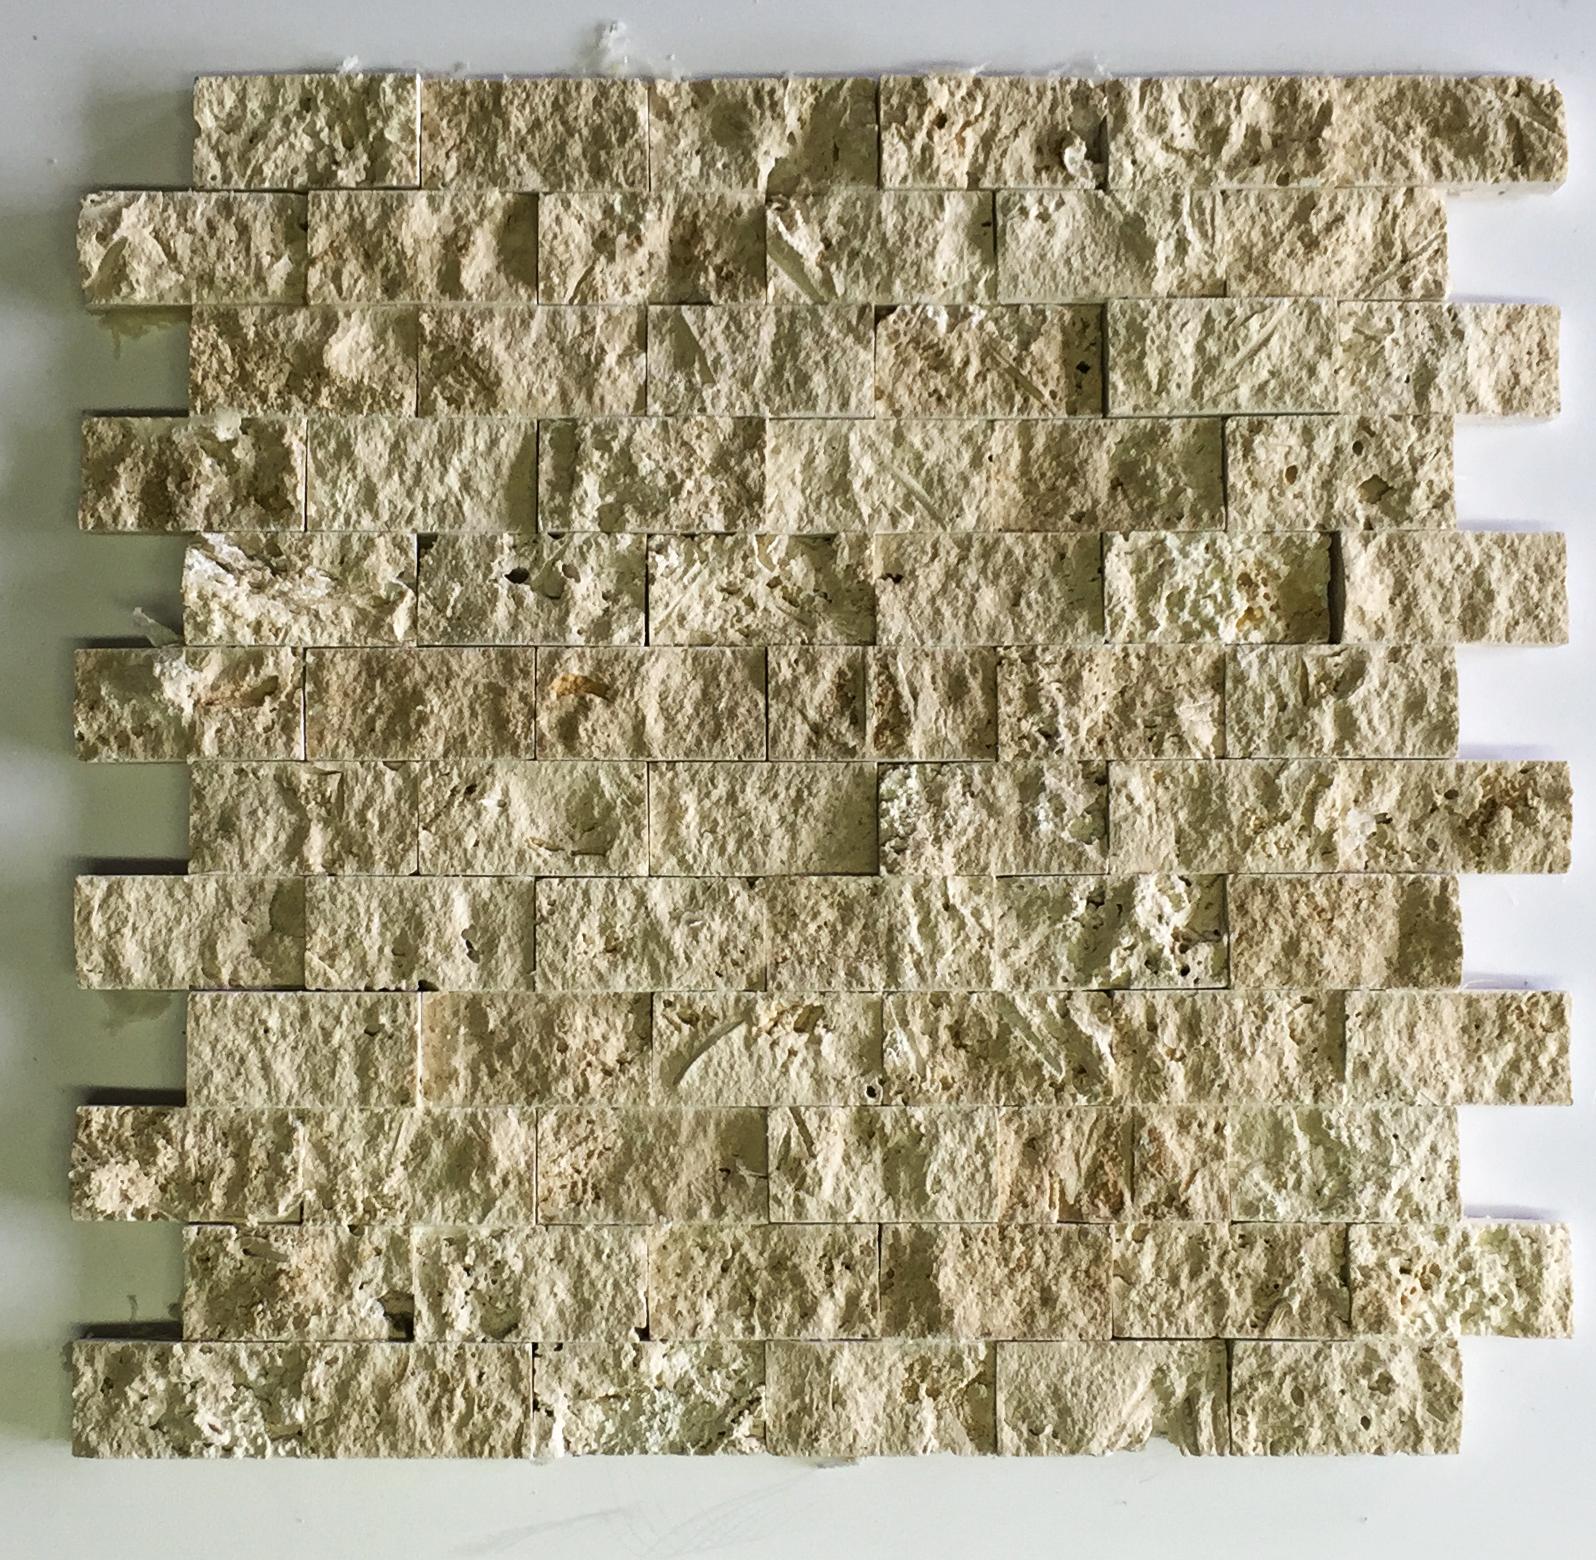 "Light (Chiaro / Ivory) Split Face Brick - 1"" x 2"" Image"